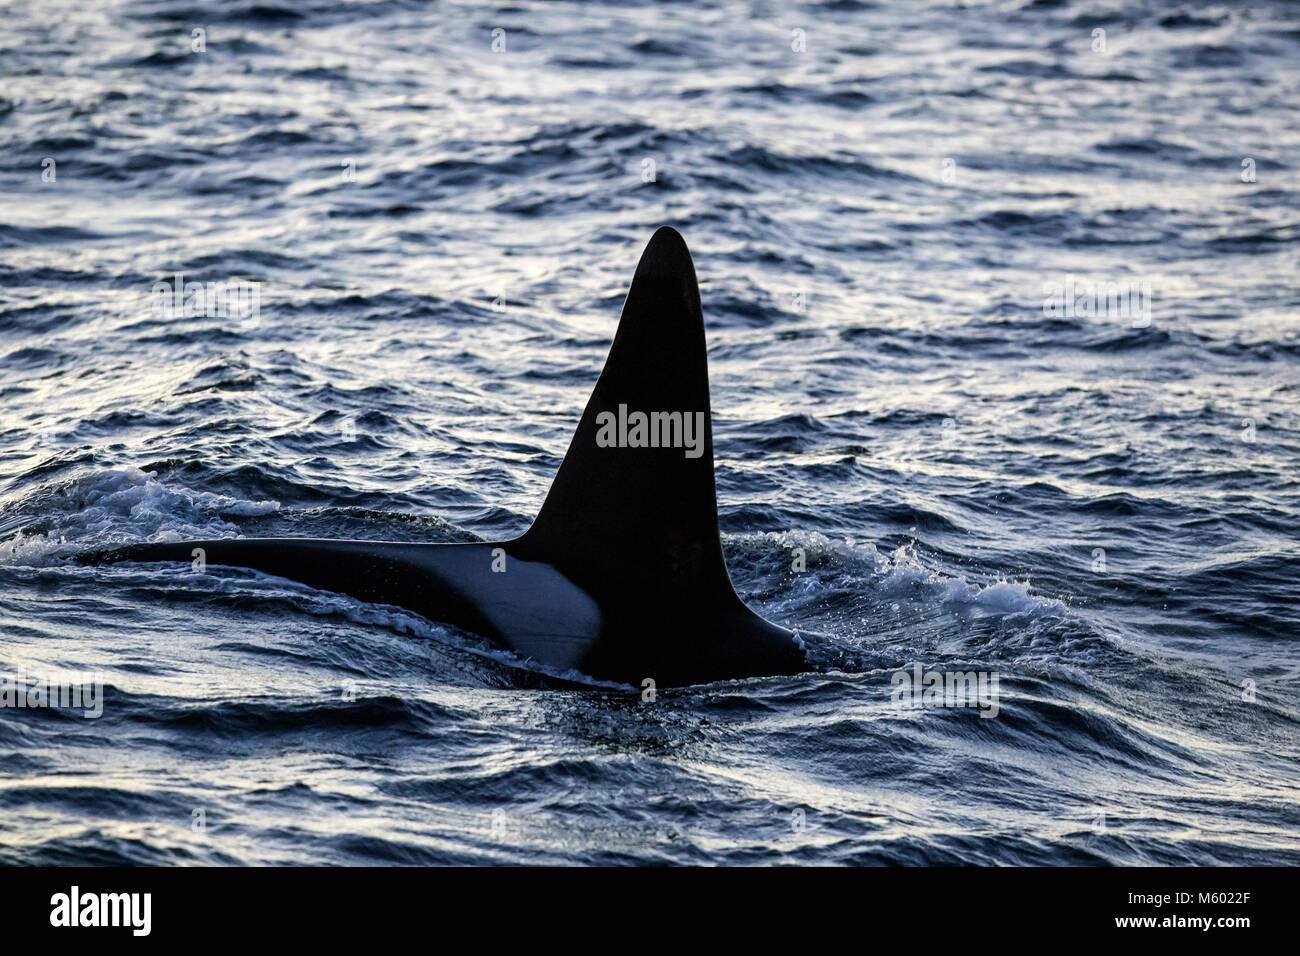 Killer Whale sobre la superficie del agua, Orcinus orca, Andfjorden, la isla de Andoya, Noruega Foto de stock